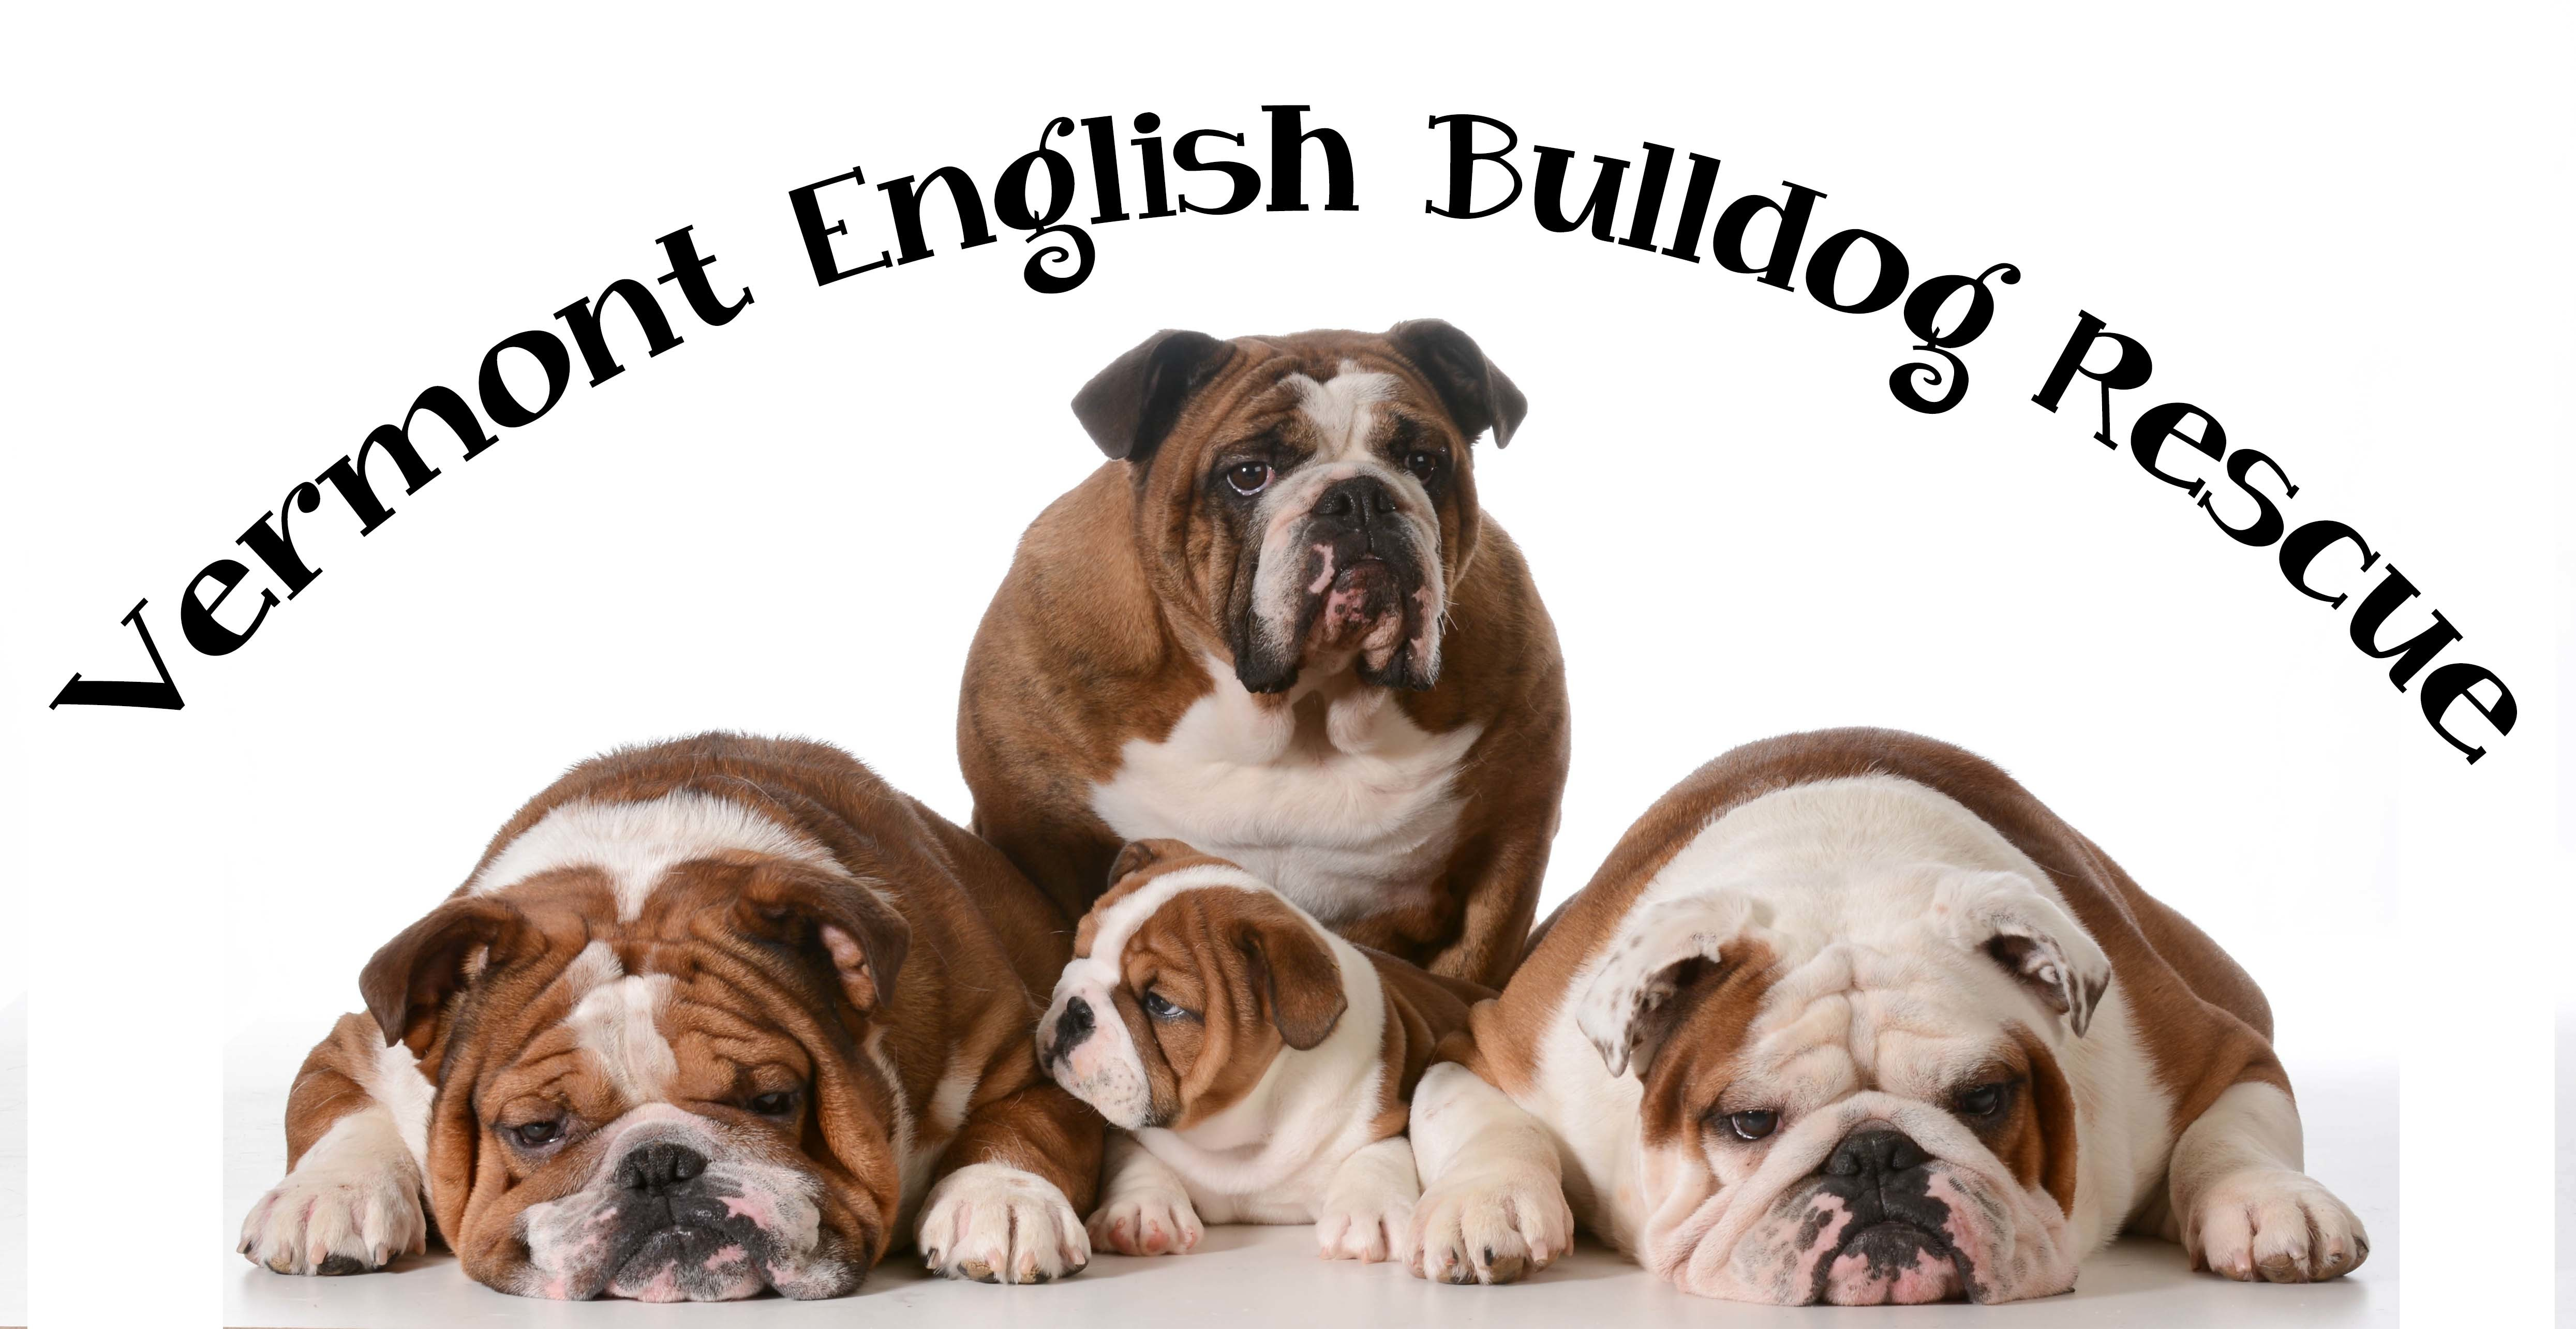 Vermont English Bulldog Rescue